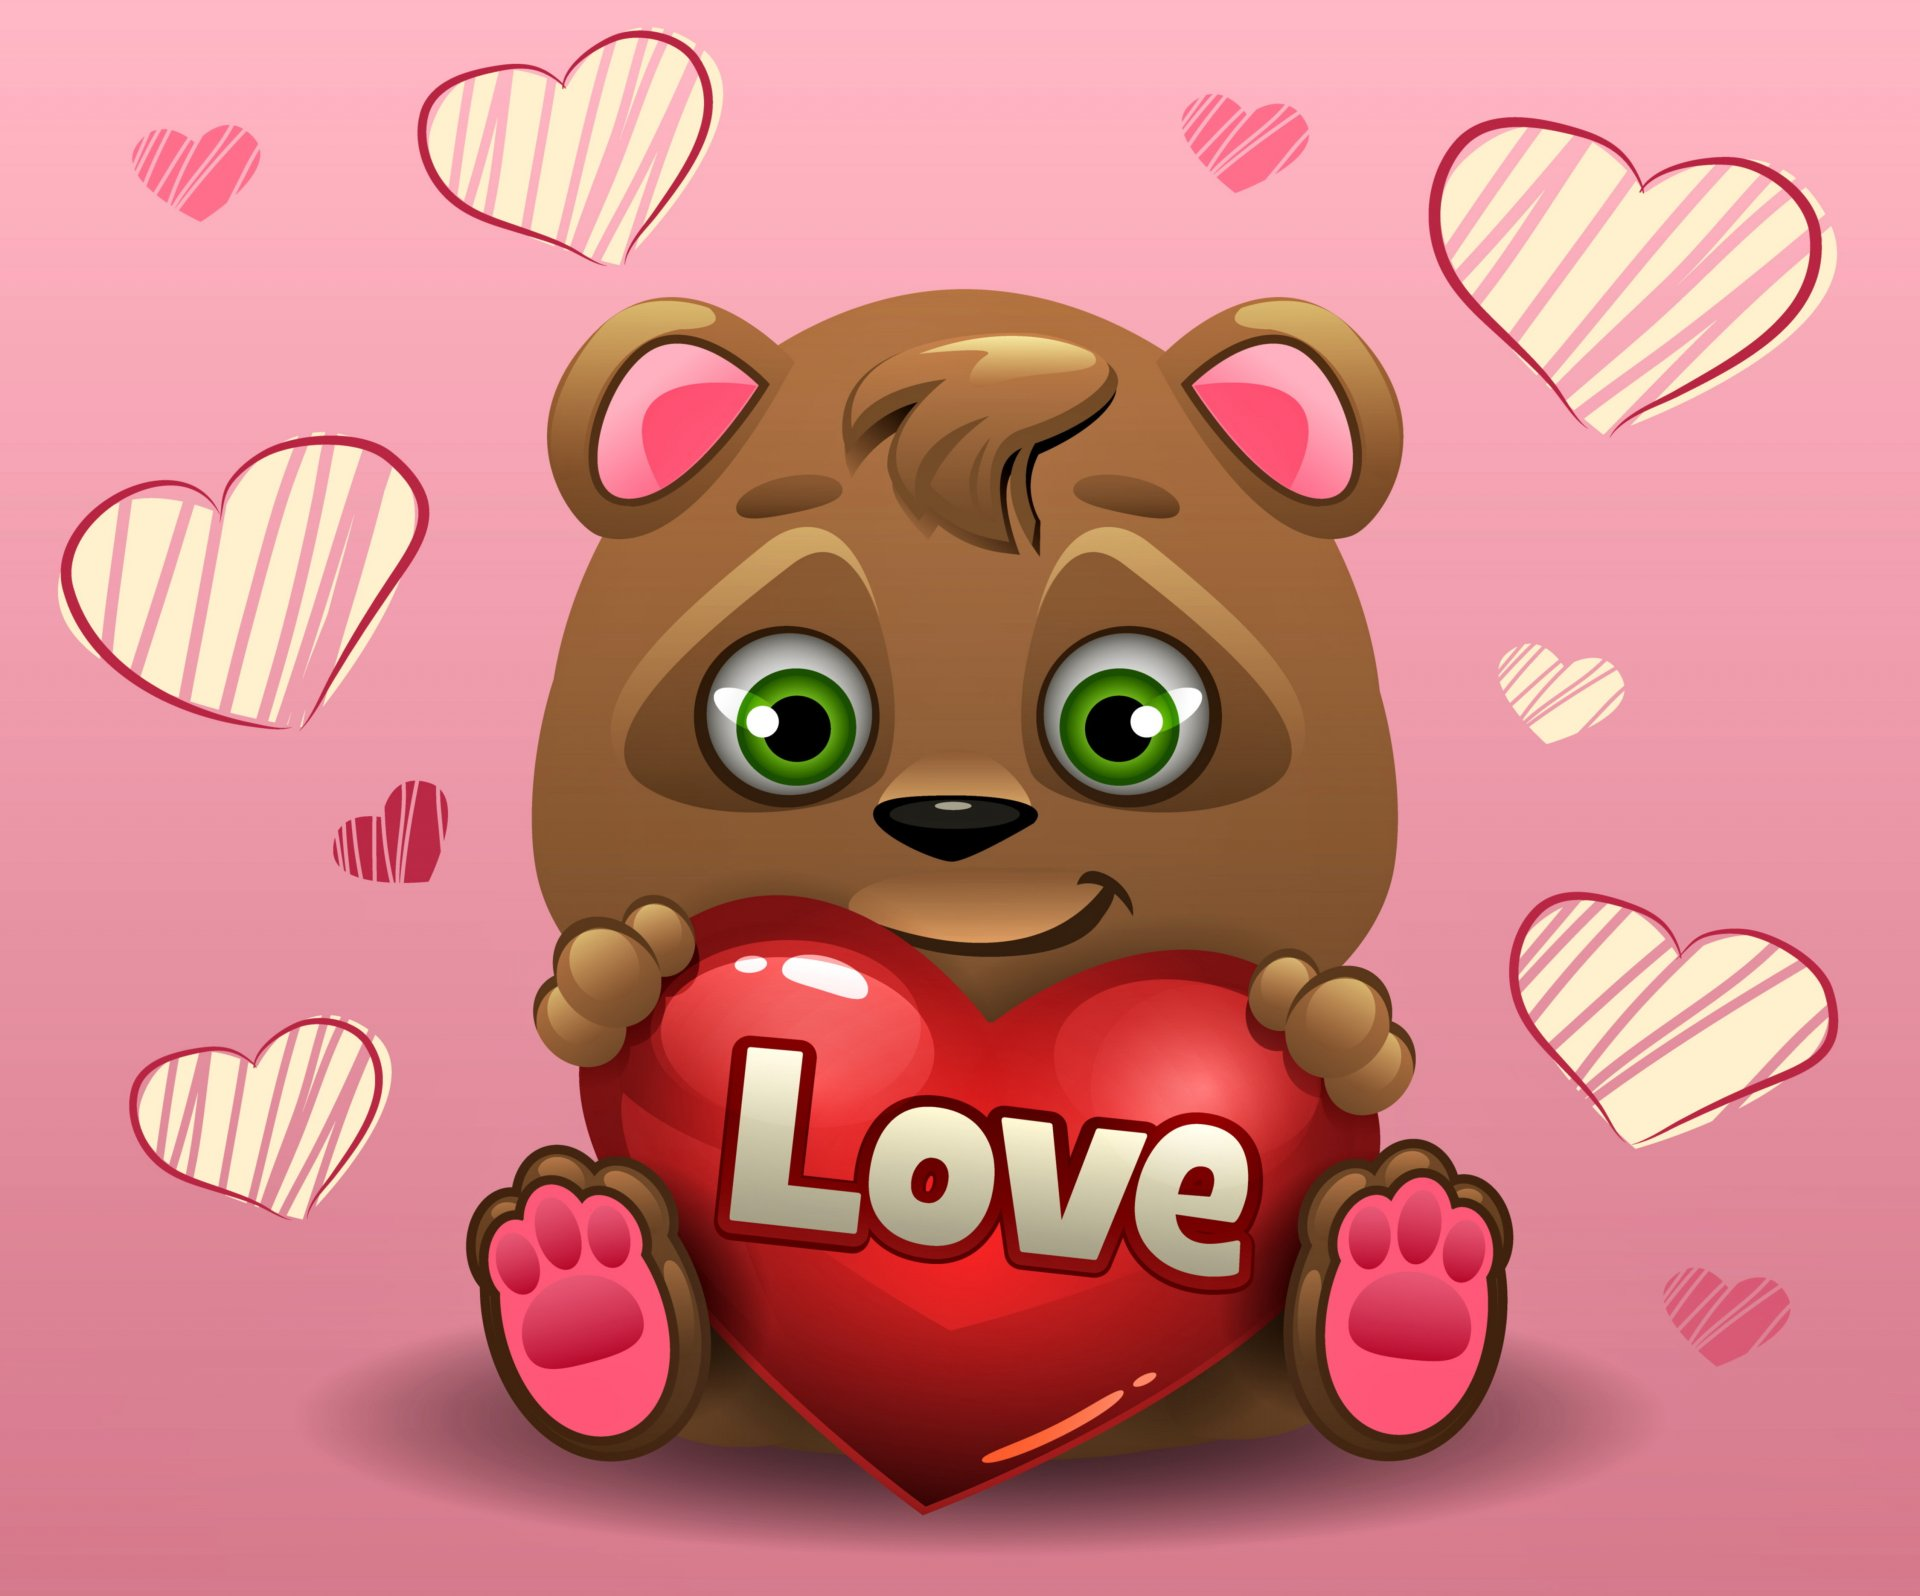 Гиф, картинки на открытку с любовью